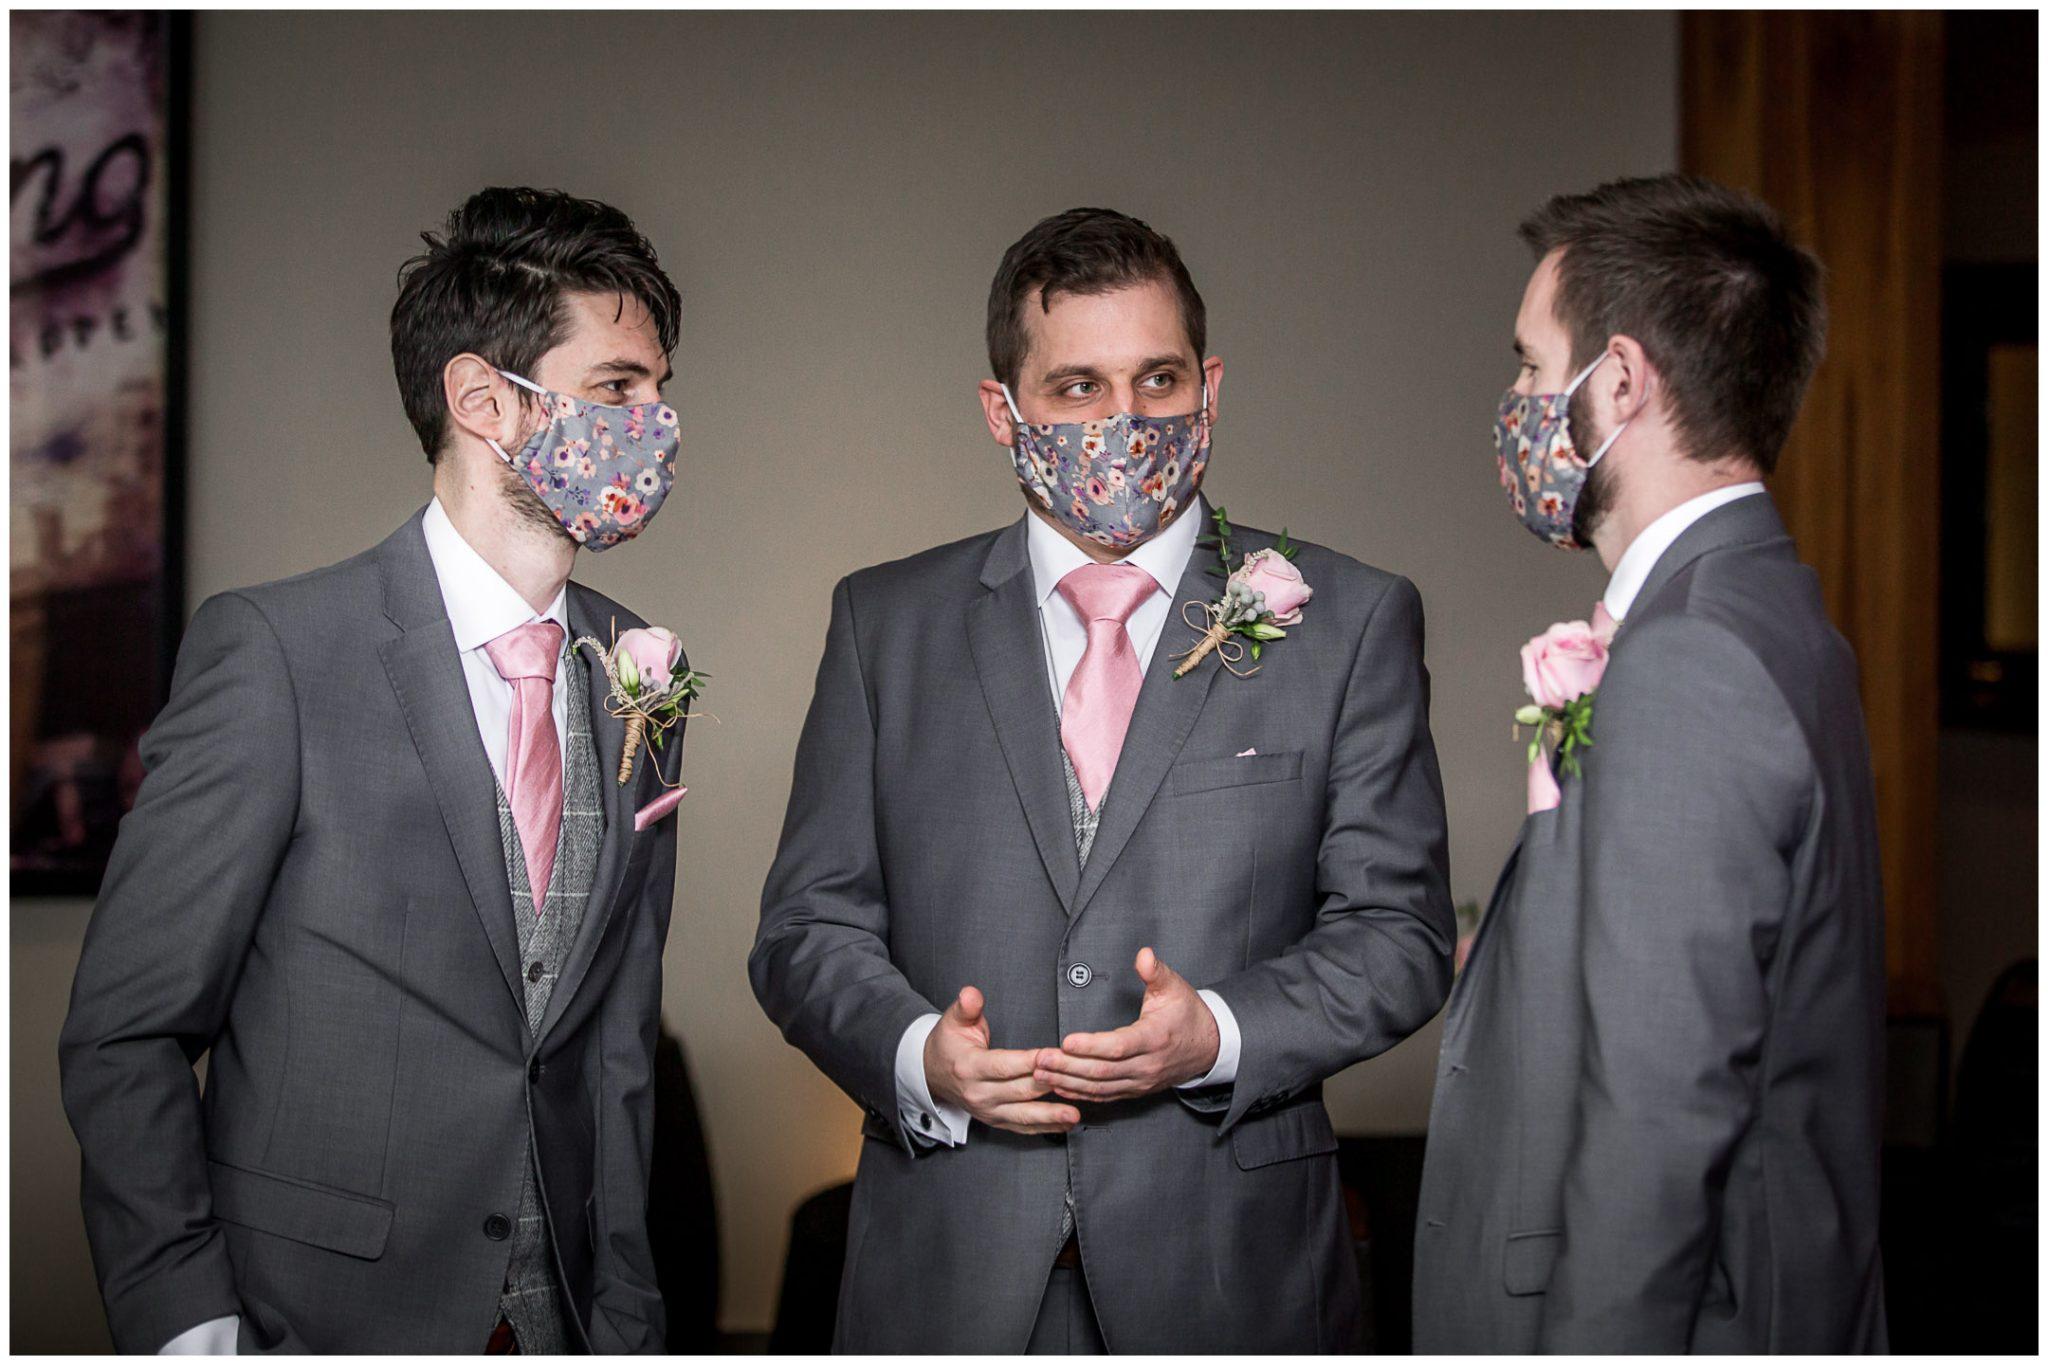 Groomsmen wearing covid masks